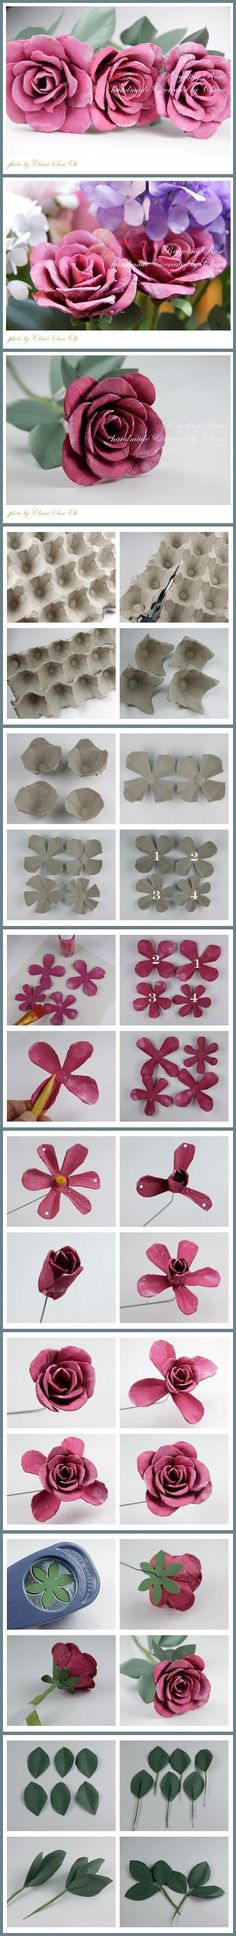 DIY upcycle egg box roses pink roses diy easy crafts diy ideas diy crafts do it yourself easy diy diy flowers craft flowers diy decor craft decor diy craft ideas diy tutorials